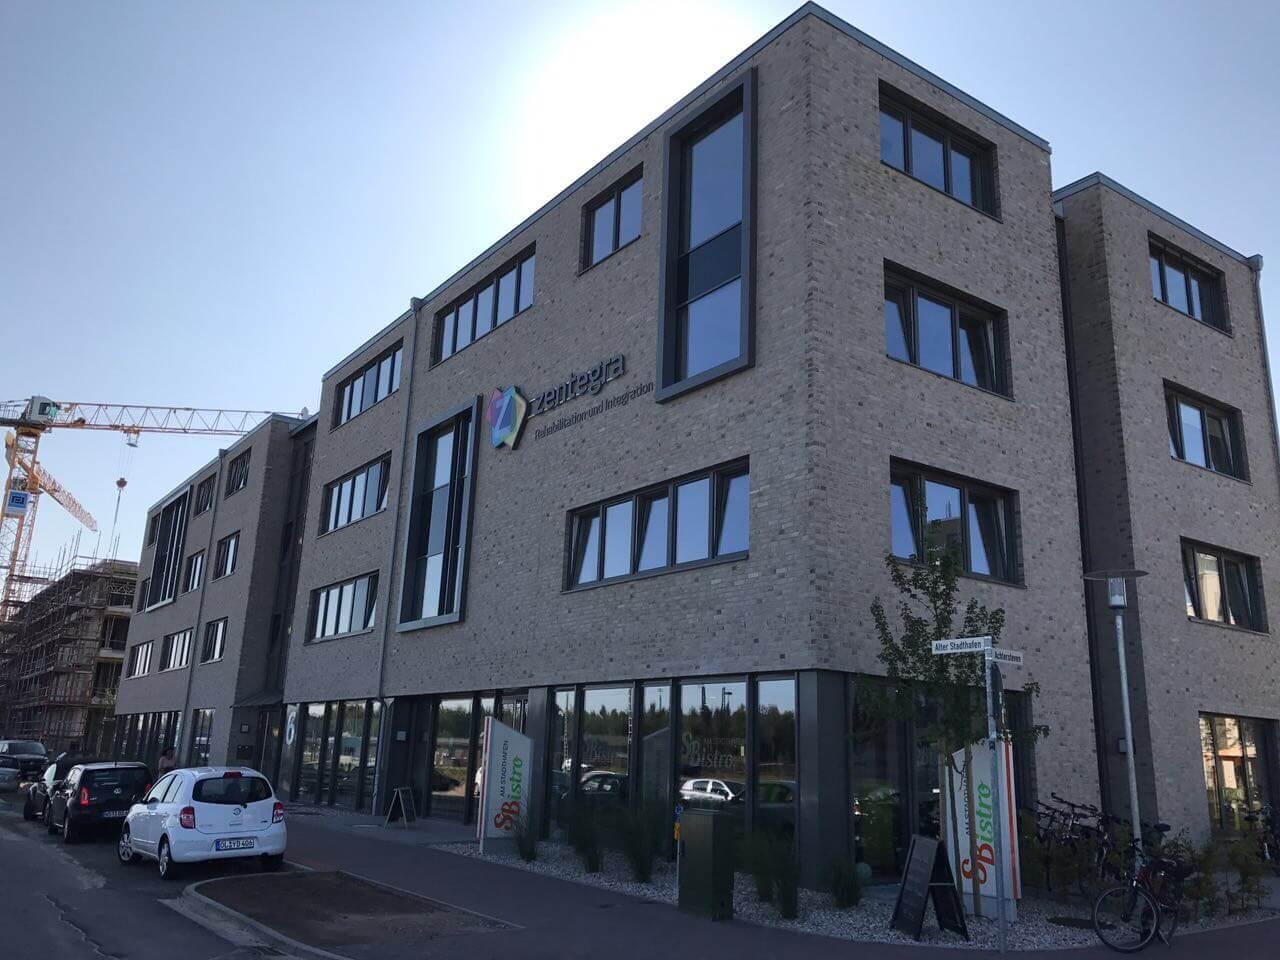 Rehazentrum in Oldenburg